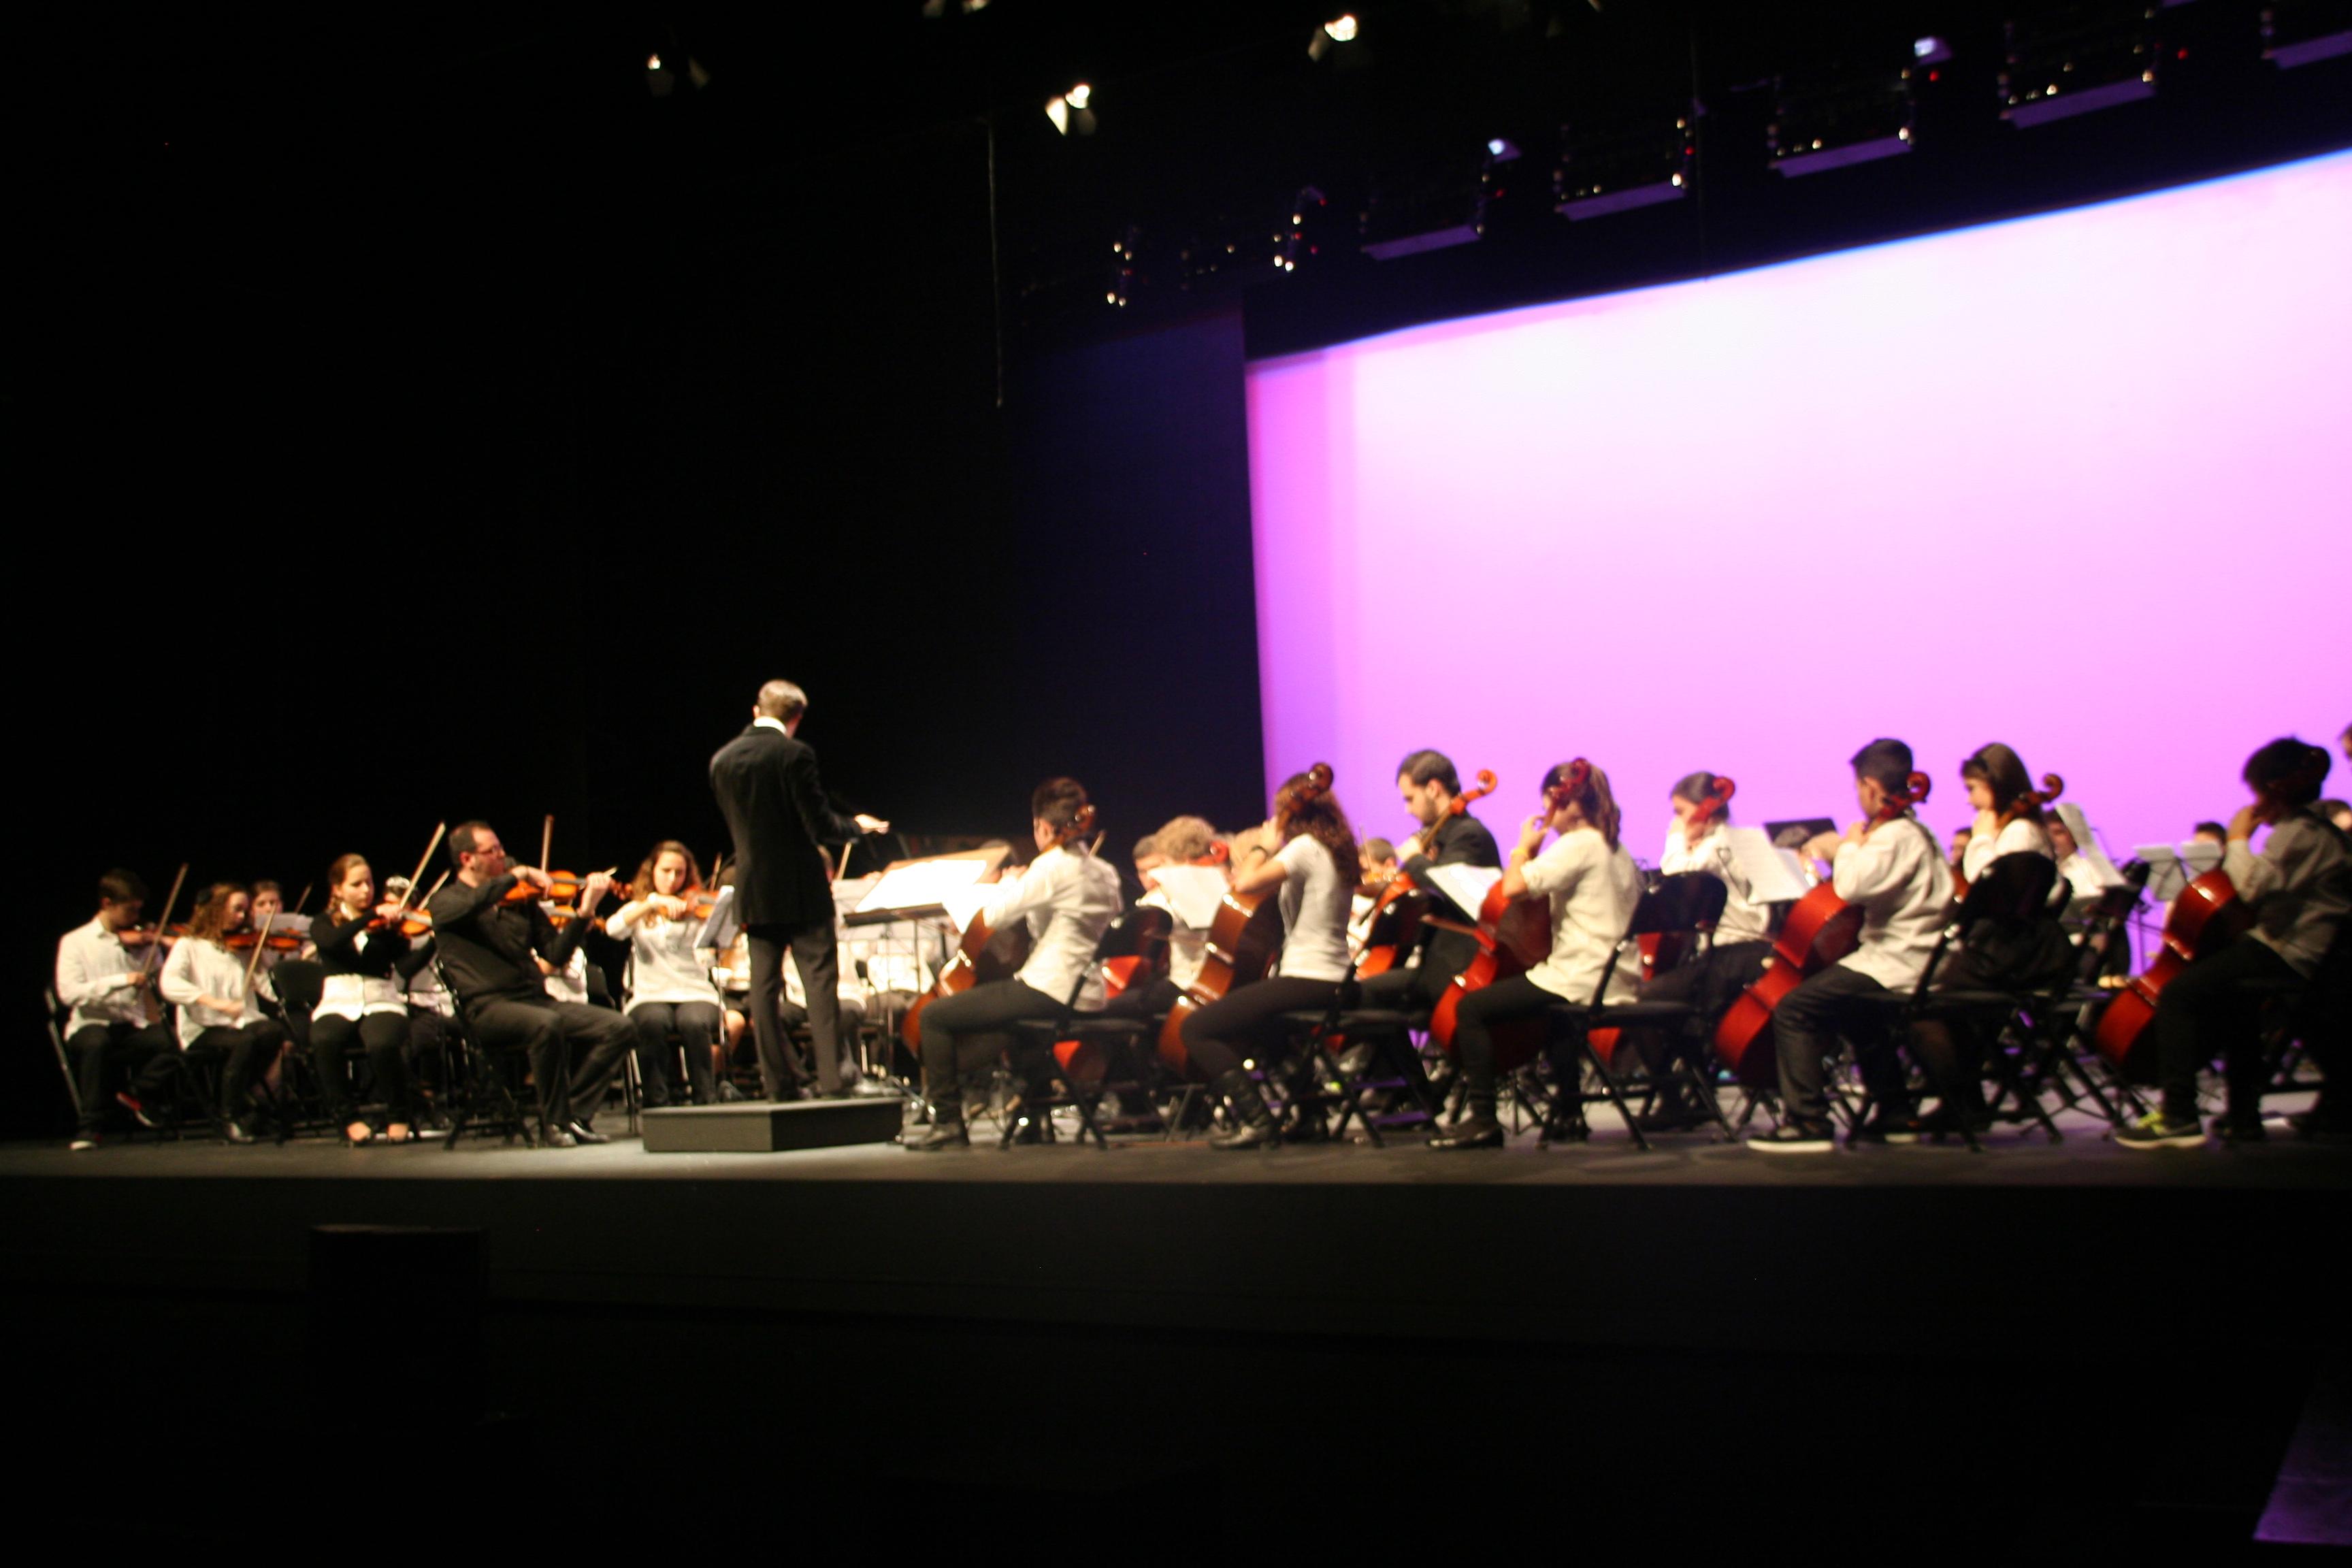 concerts4good 133